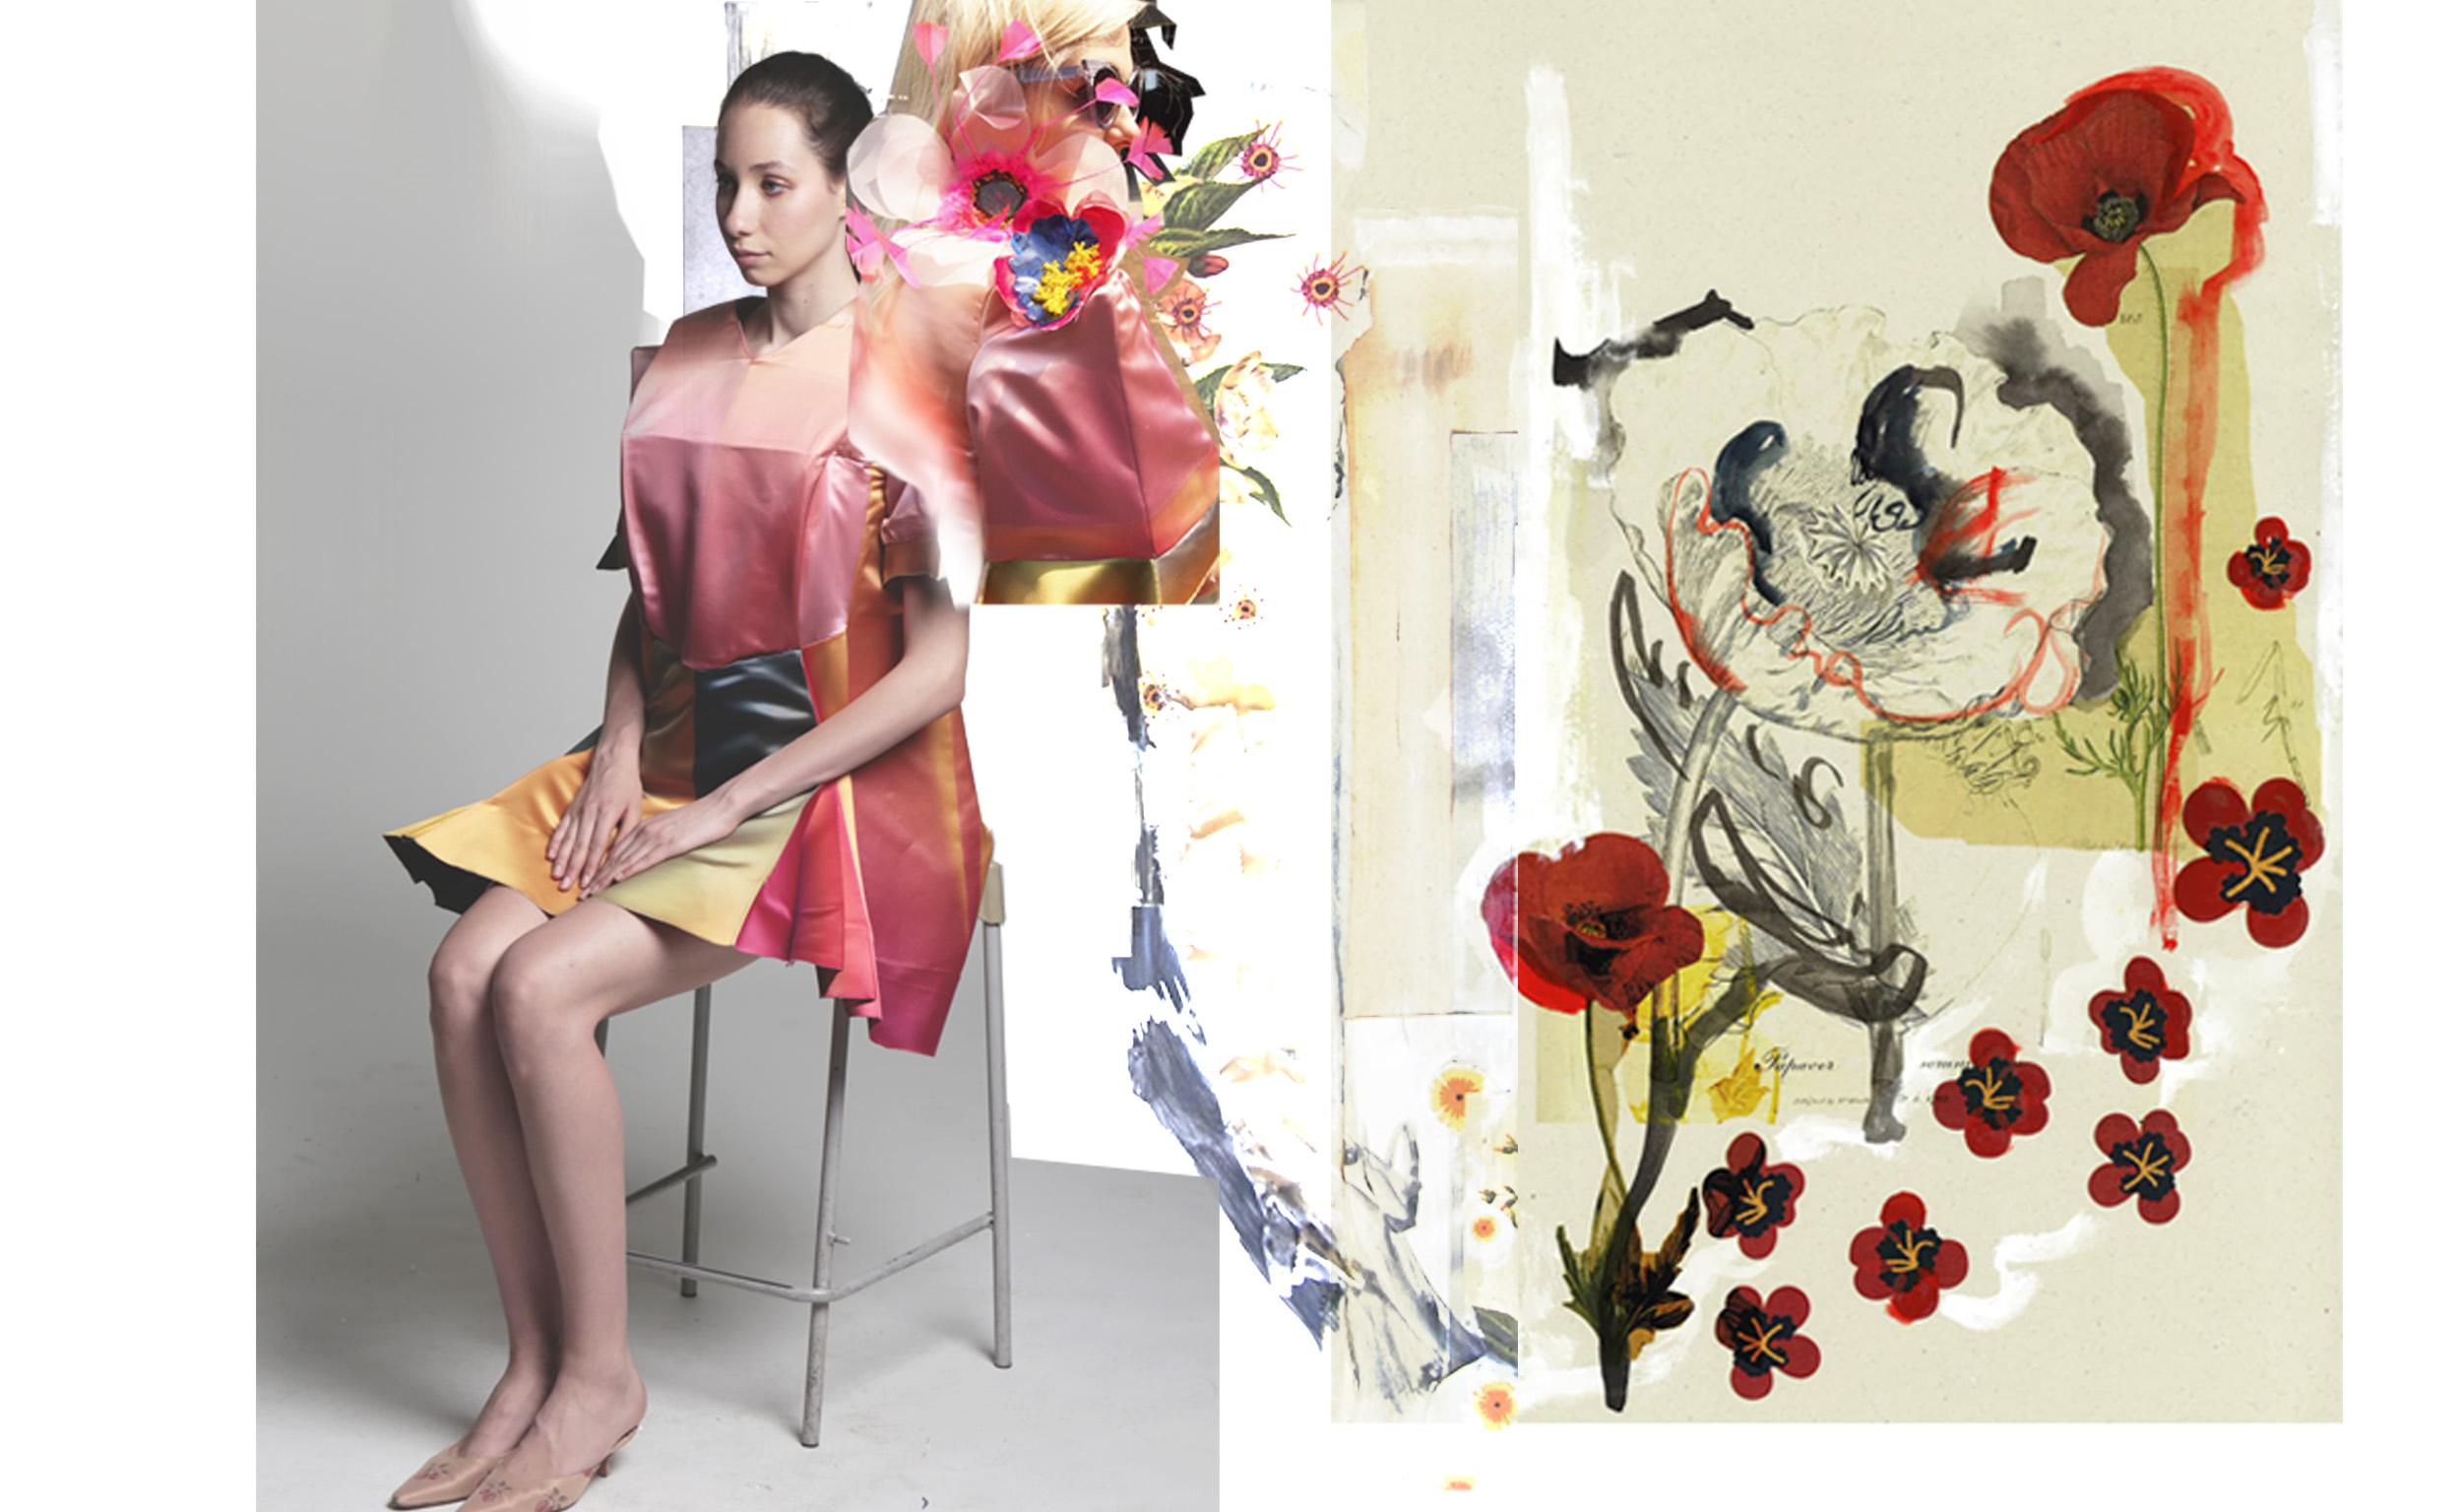 gallery-portfolio-finalfantasy7-intro.jpg